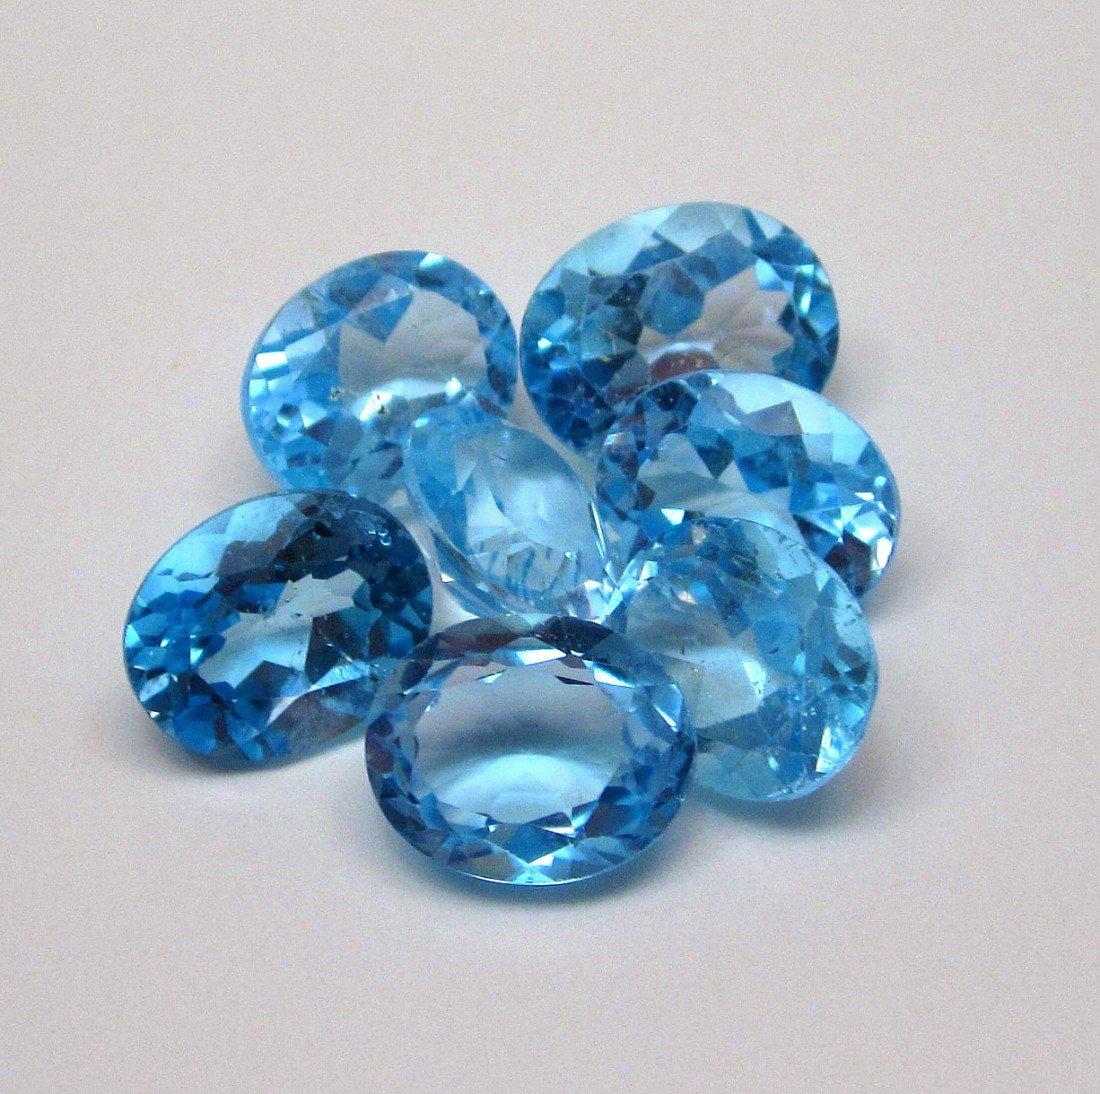 2W: A 31.40 ct Loose Topaz parcel gemstone VVS